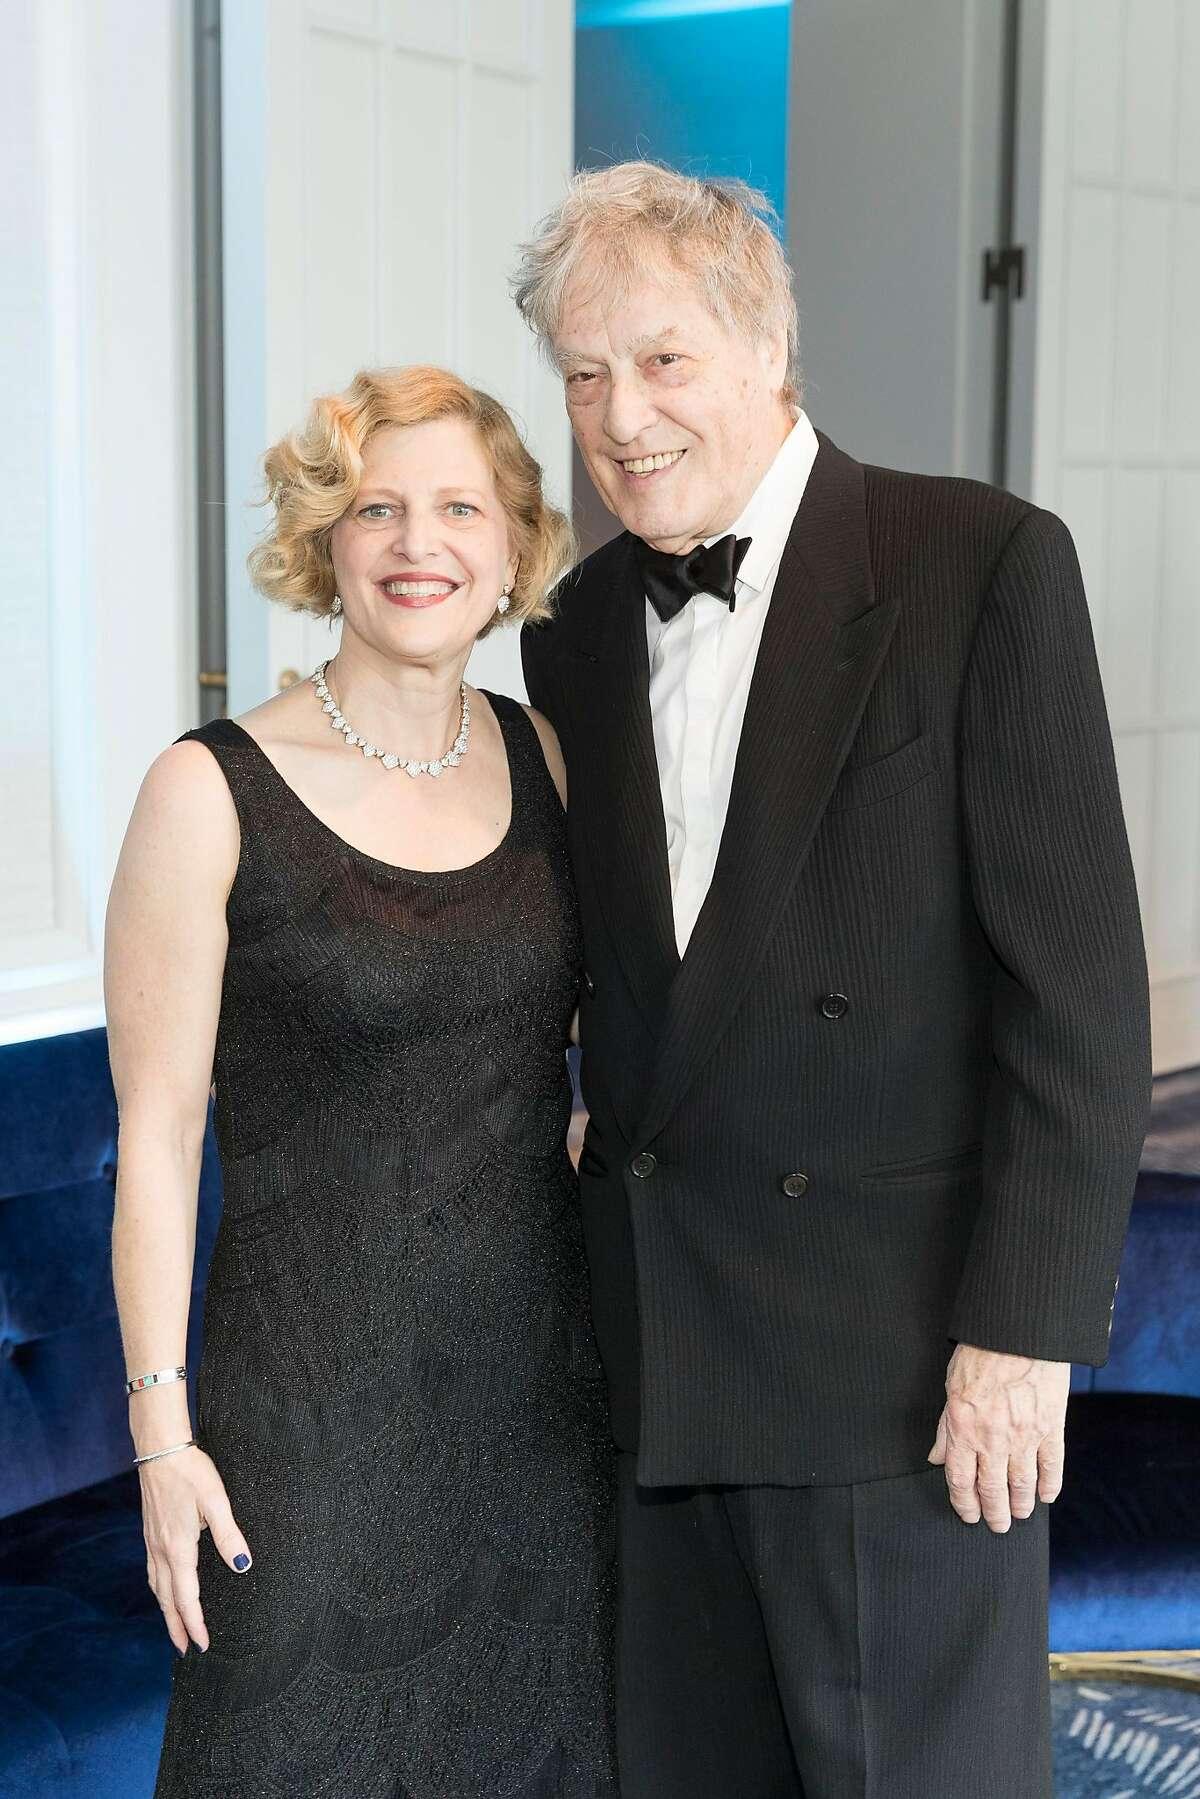 Carey Perloff and Tom Stoppard at ACT gala honoring Perloff